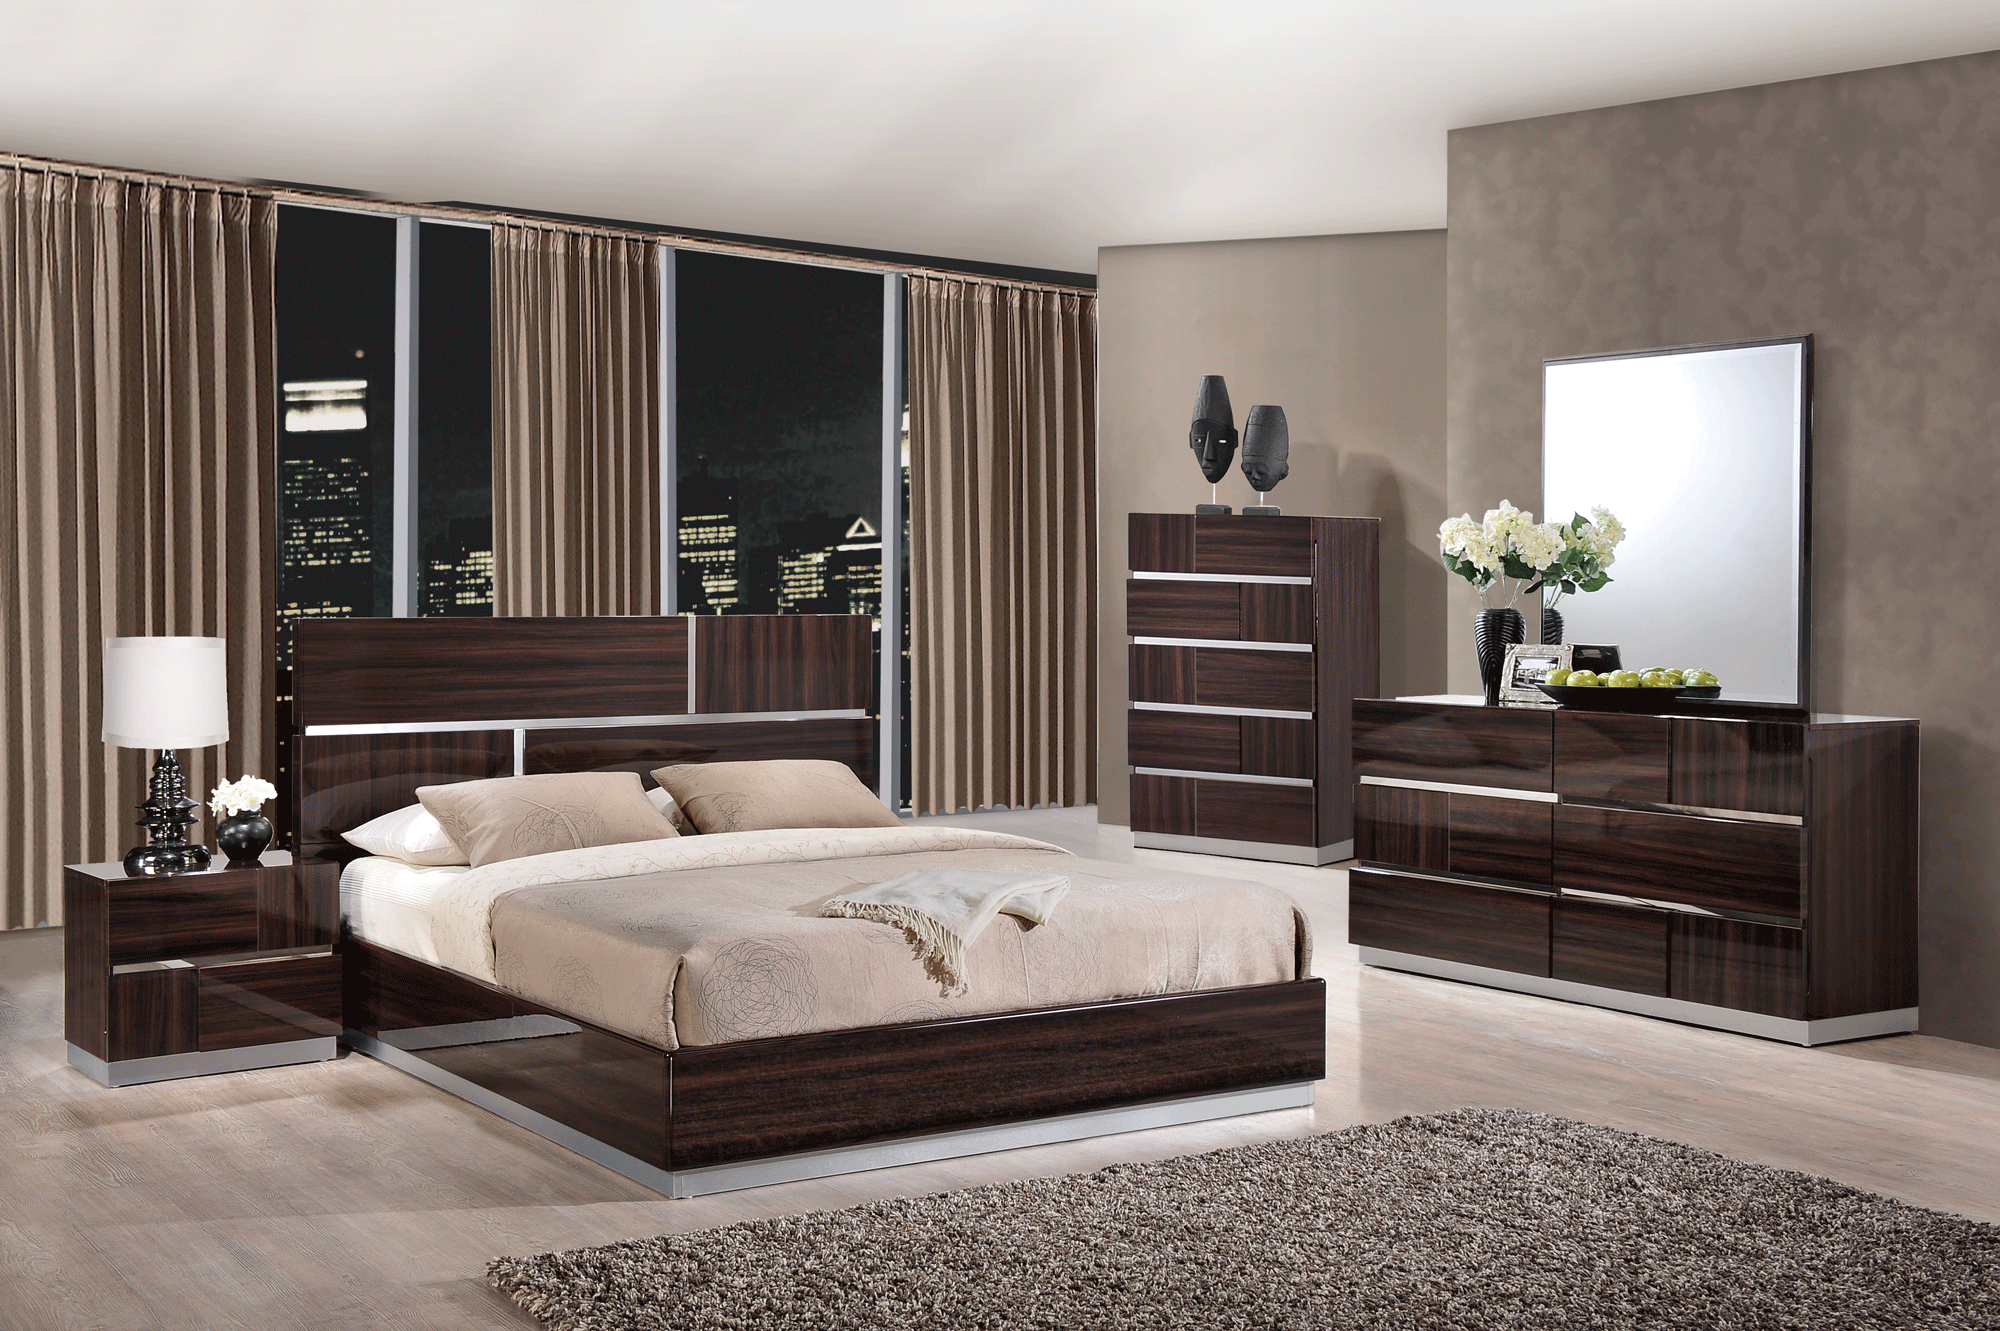 Tribeca Wood Grain Glossy Bedroom Set by Global Furniture